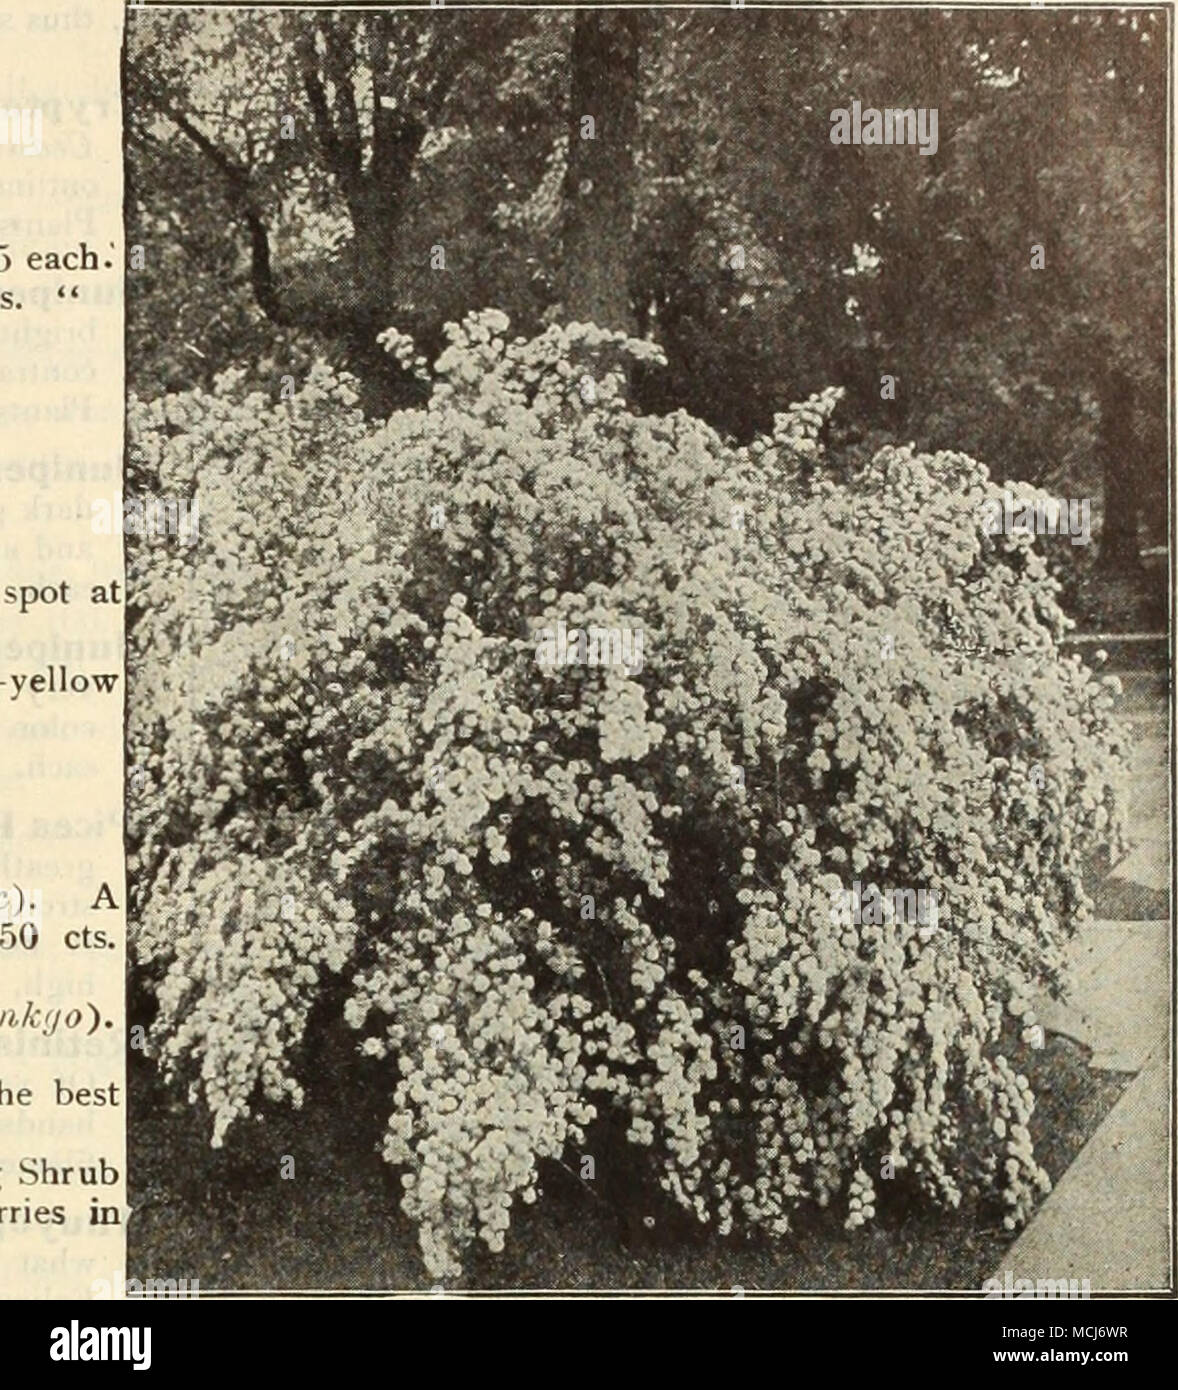 Spiraea Van Houttei Golden Double White Symphoricarpus Racemosus